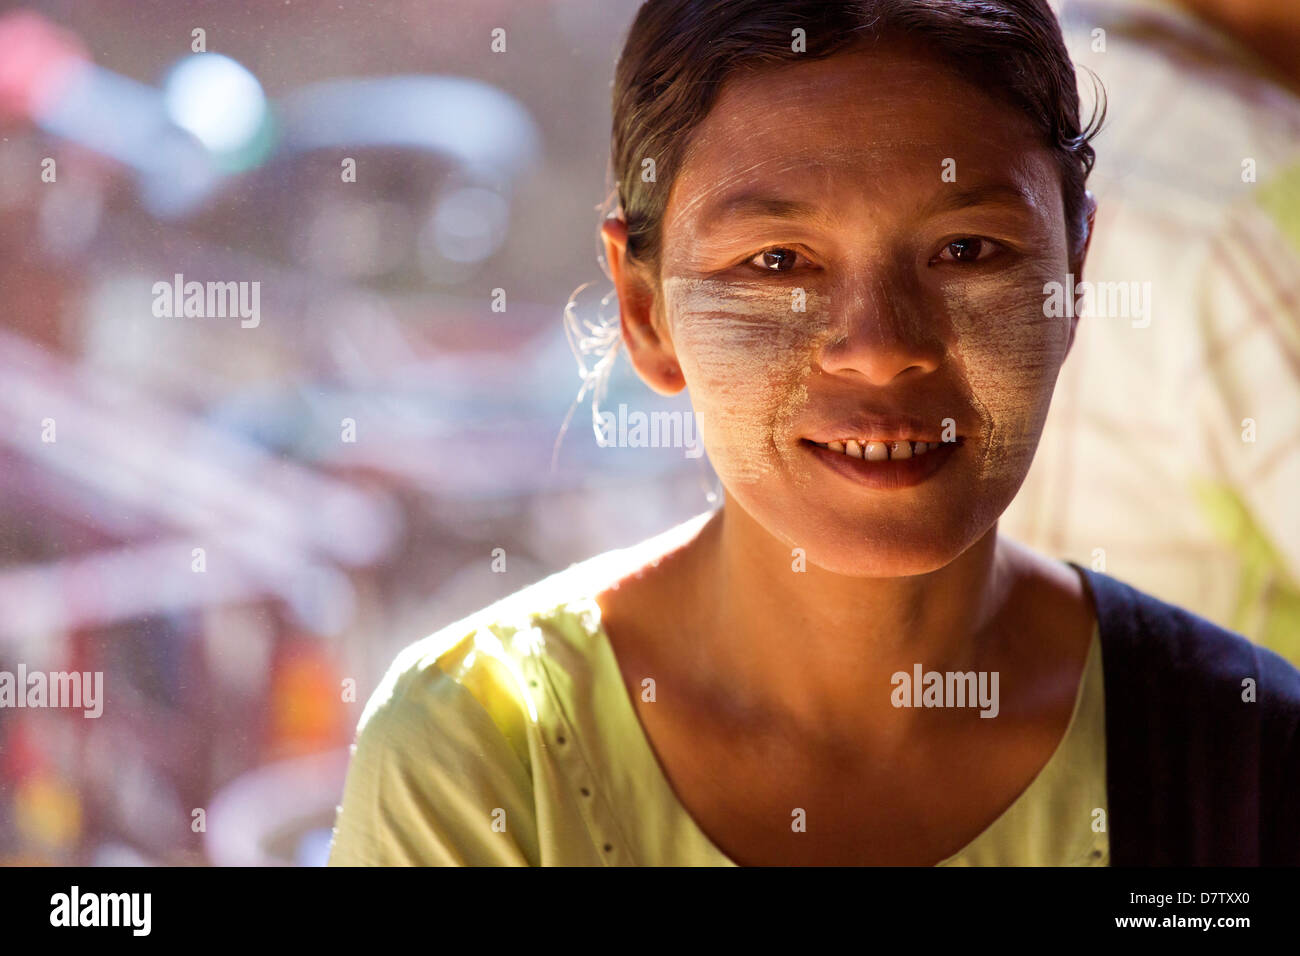 Local woman with Thanakha traditional face painting, Thiri Mingalar Market, Yangon (Rangoon), Burma - Stock Image